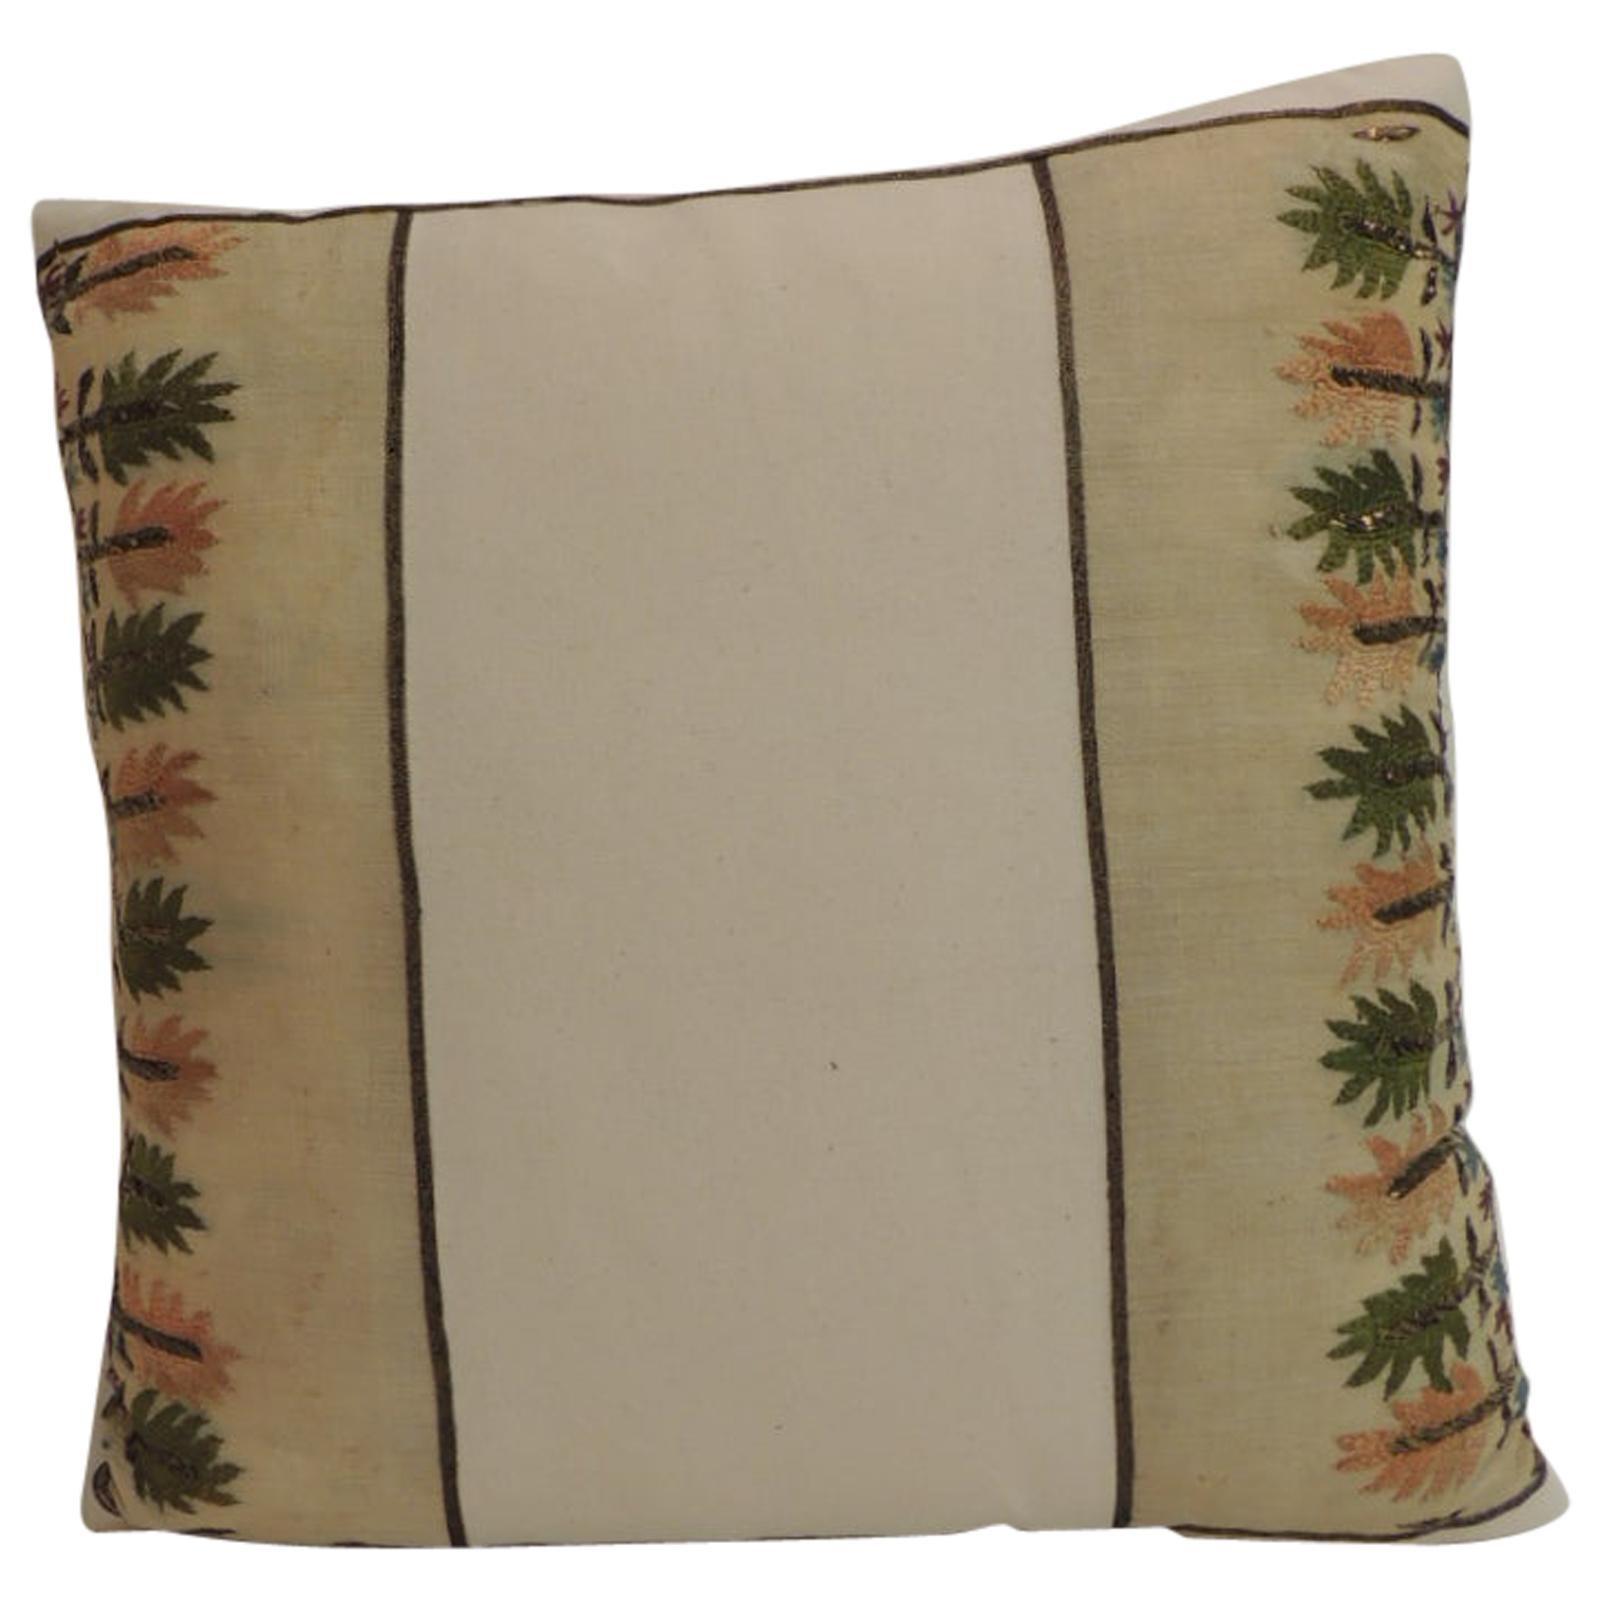 Petite Orange and Green Embroidered Linen Square Decorative Pillow